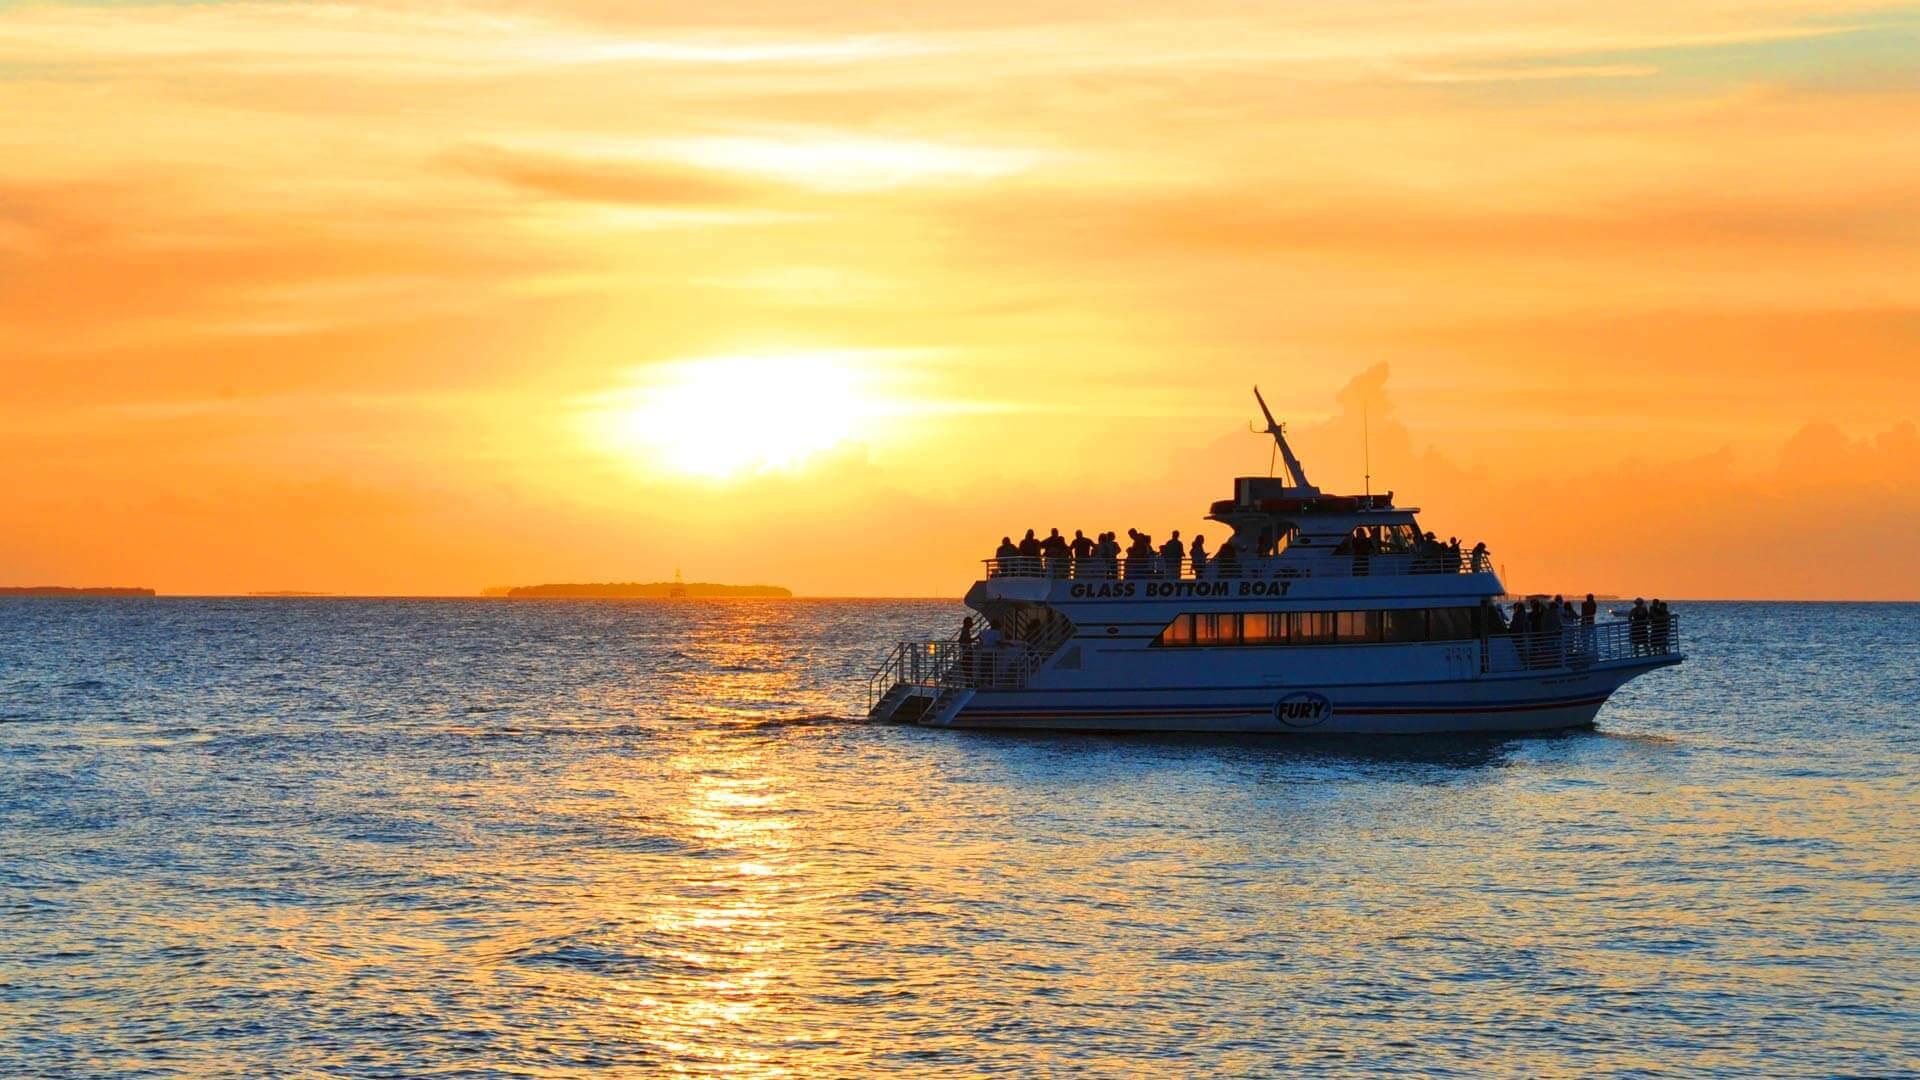 Key West Sunset Cruise and Glass Bottom Boat Combo